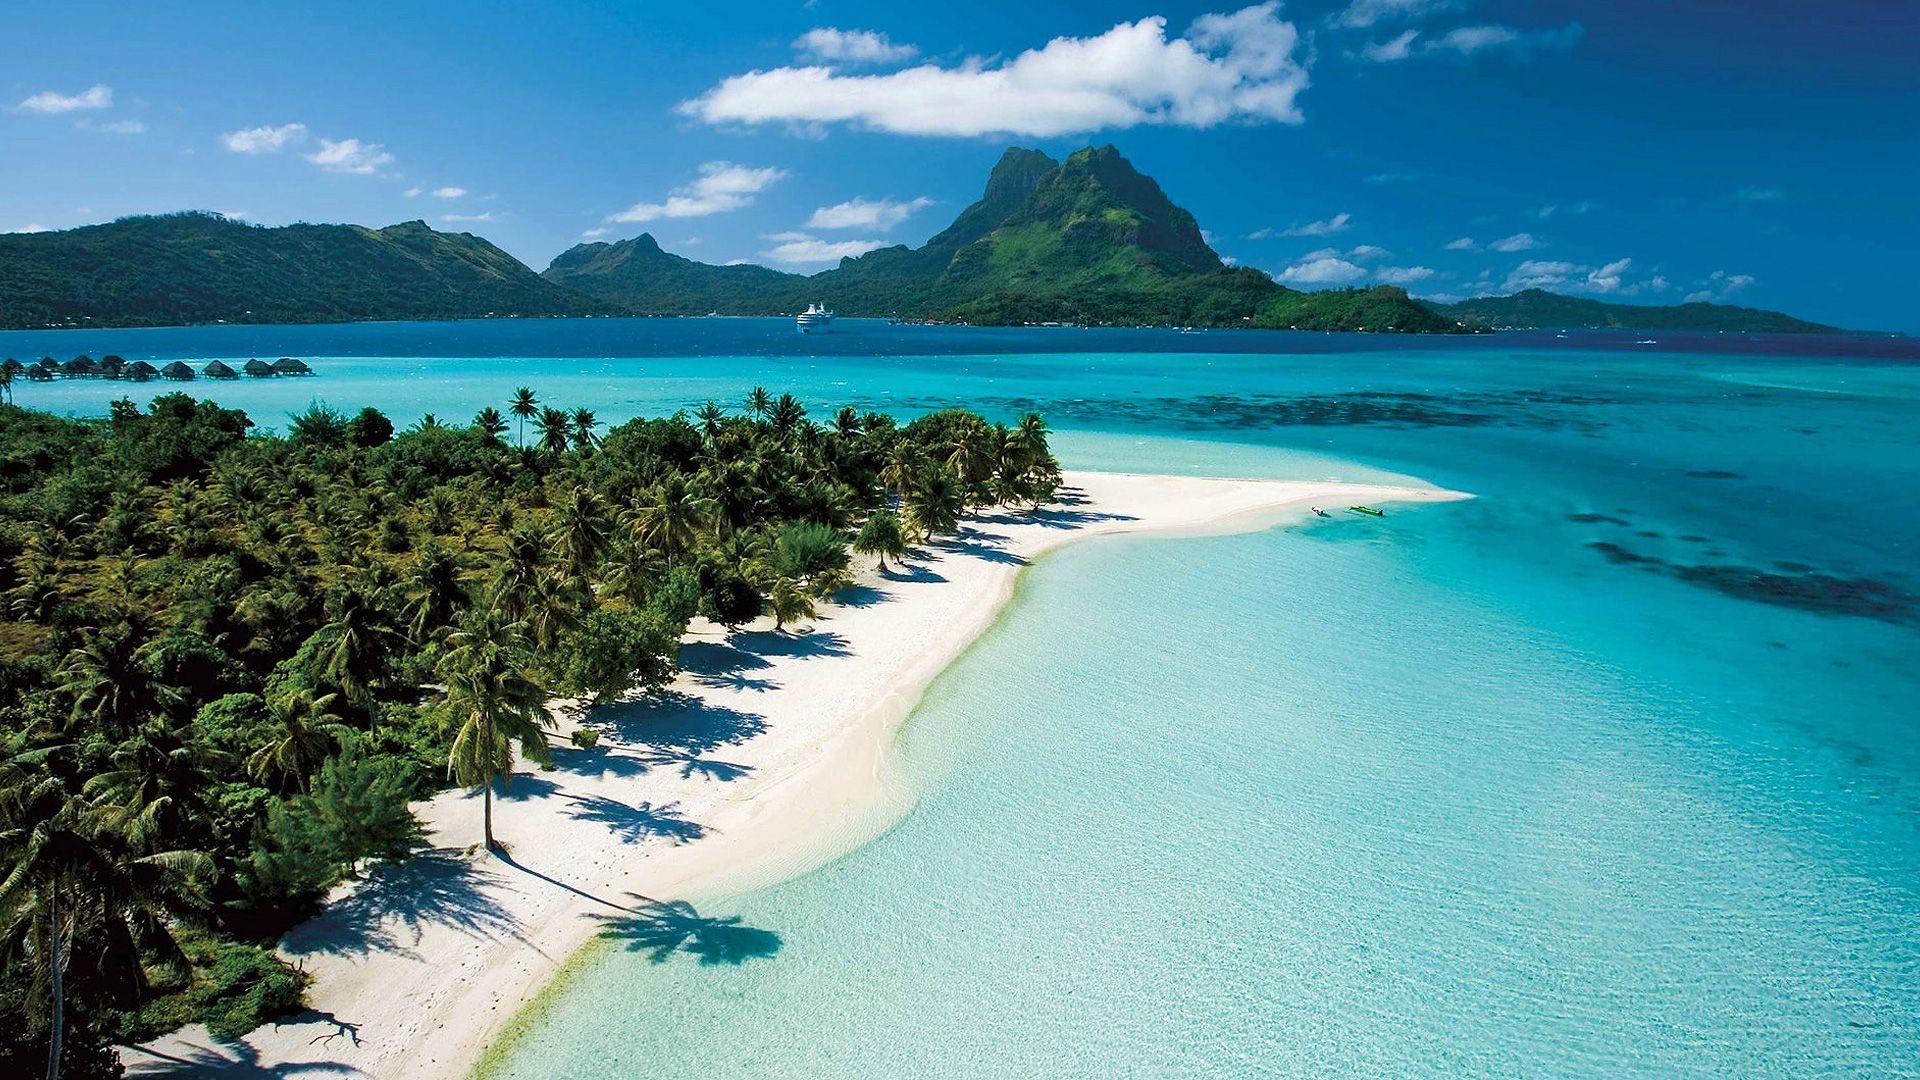 Tahiti Vacations | Plan a Trip with Tahiti Travel Agents